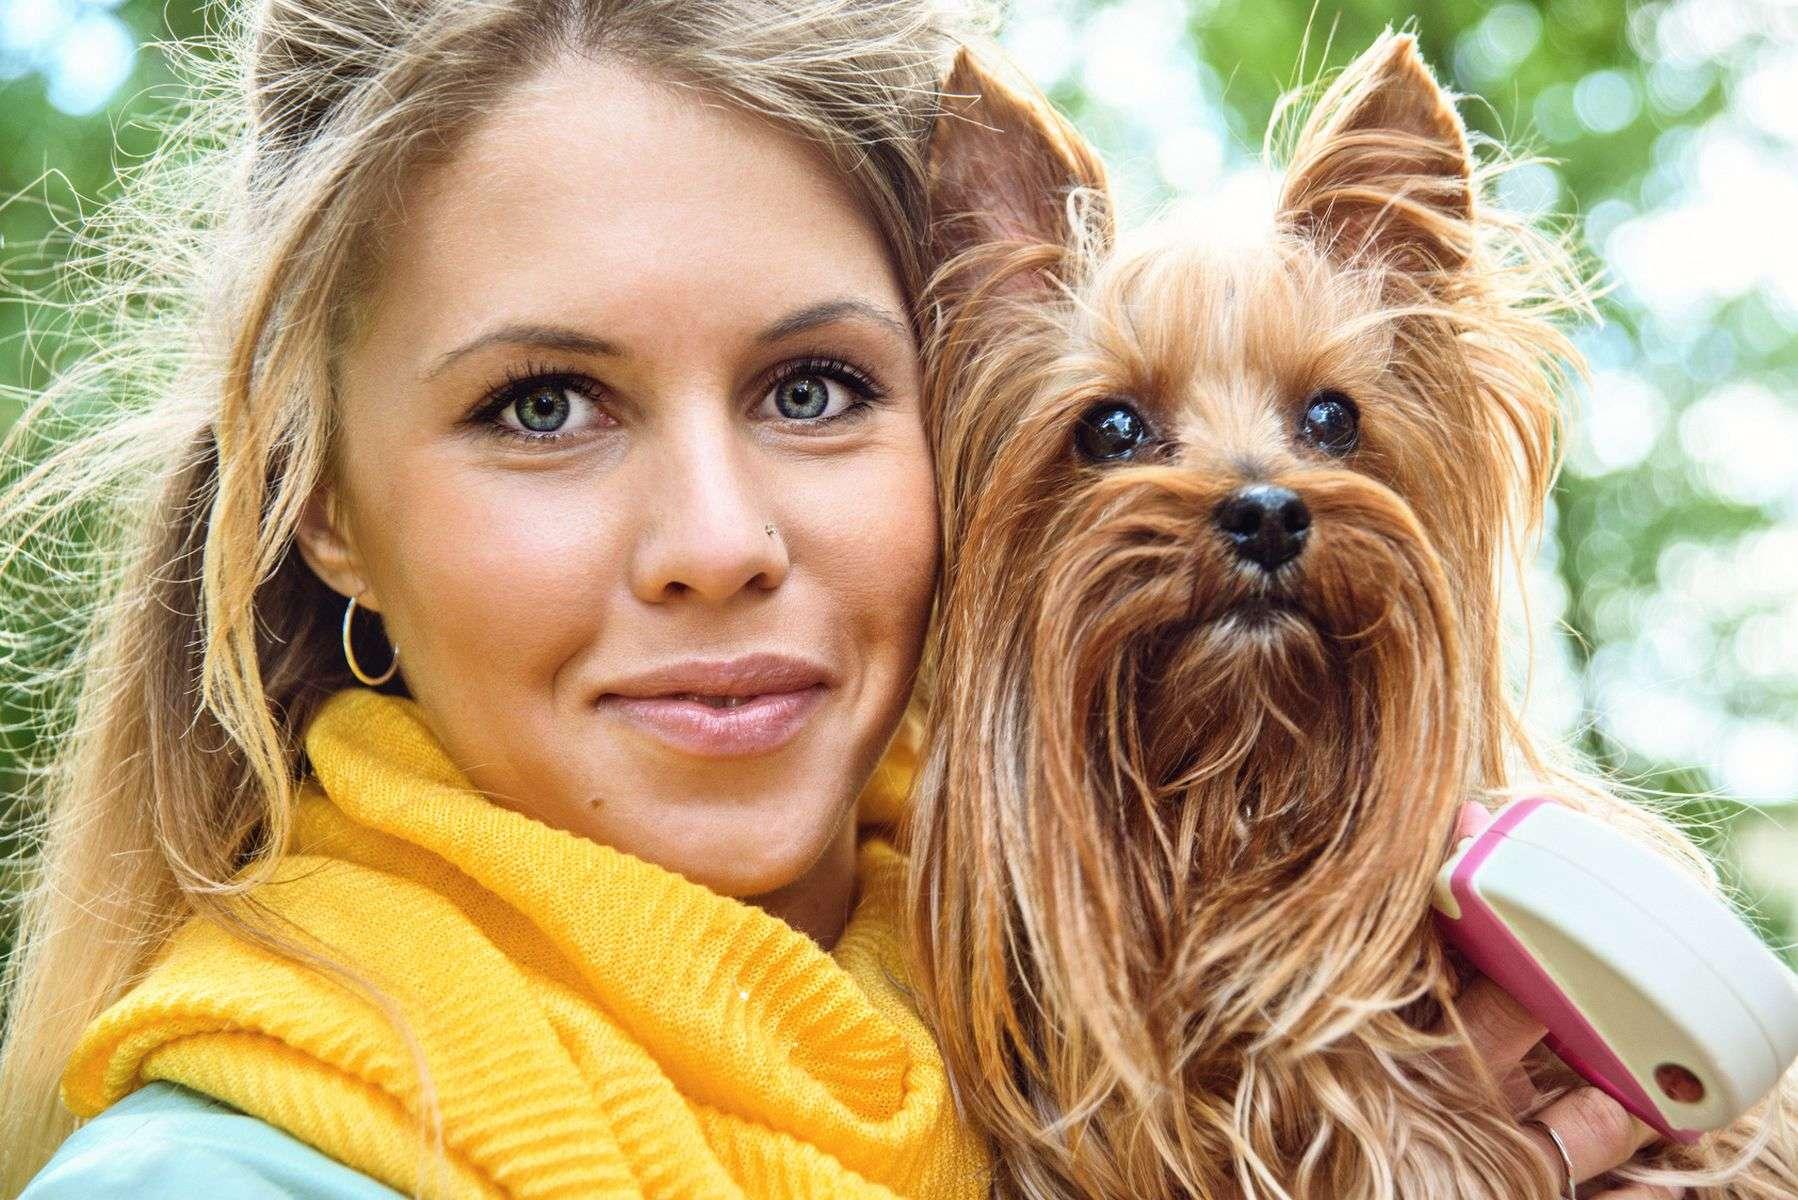 Yorkshire terrier characteristics